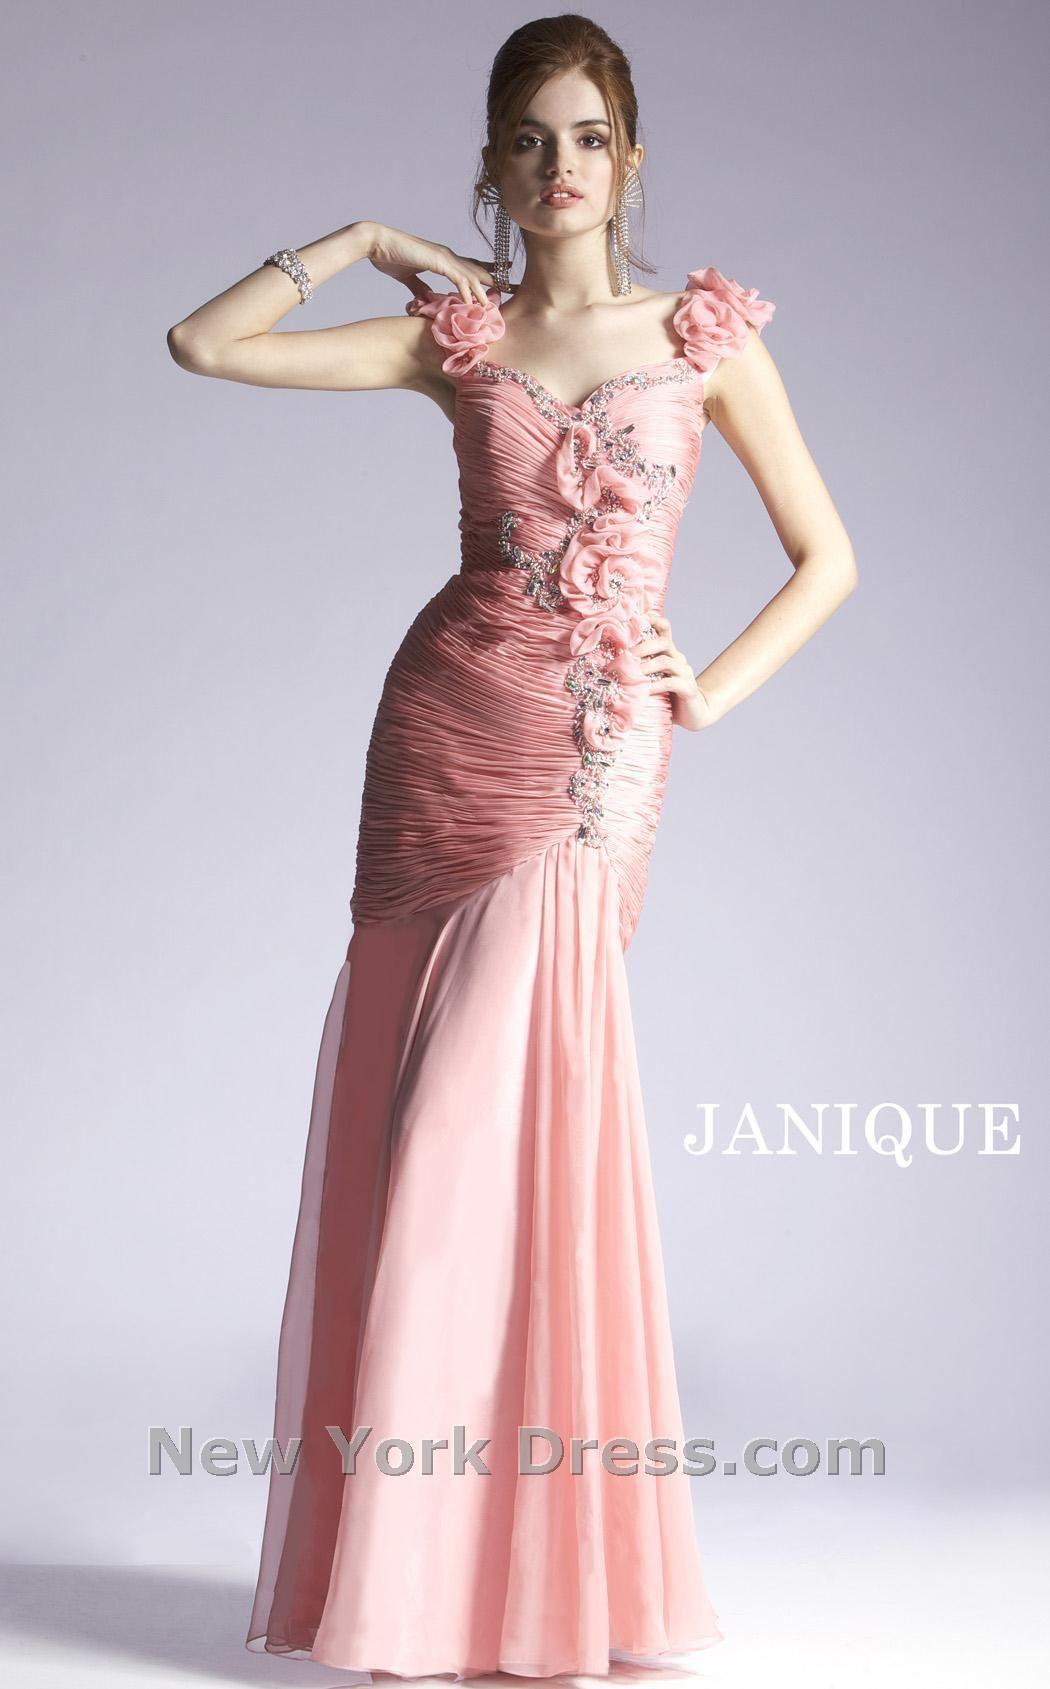 Cinderella wedding dress disney store  Janique Dress   Evening dresses Ball dresses and Pretty dresses